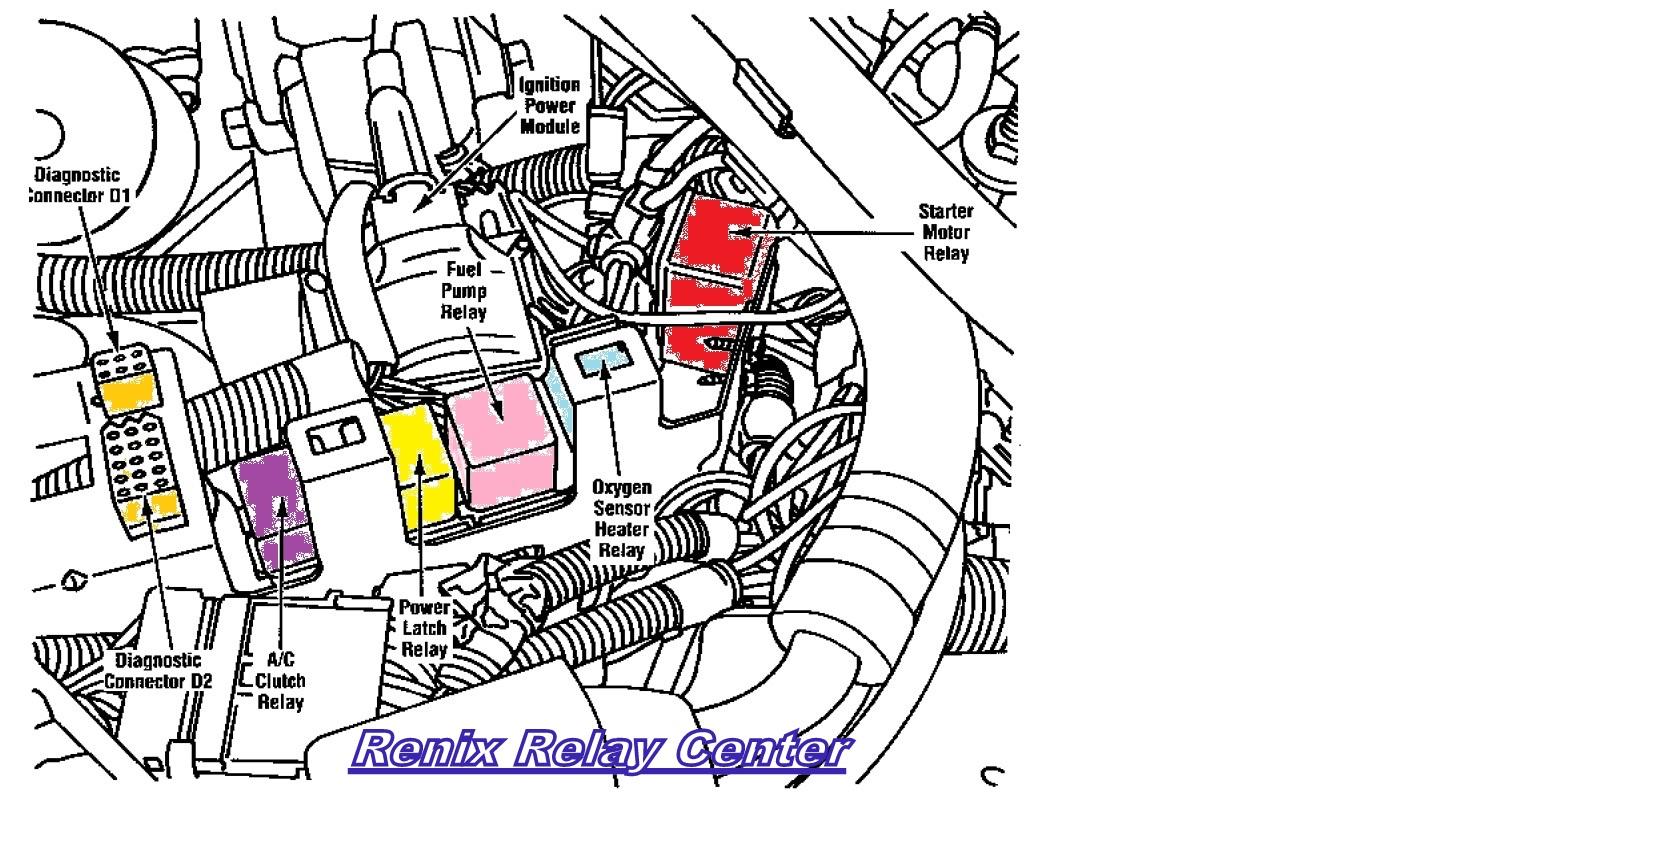 hight resolution of 89 4 0 fuel pump problem renix relay center jpg